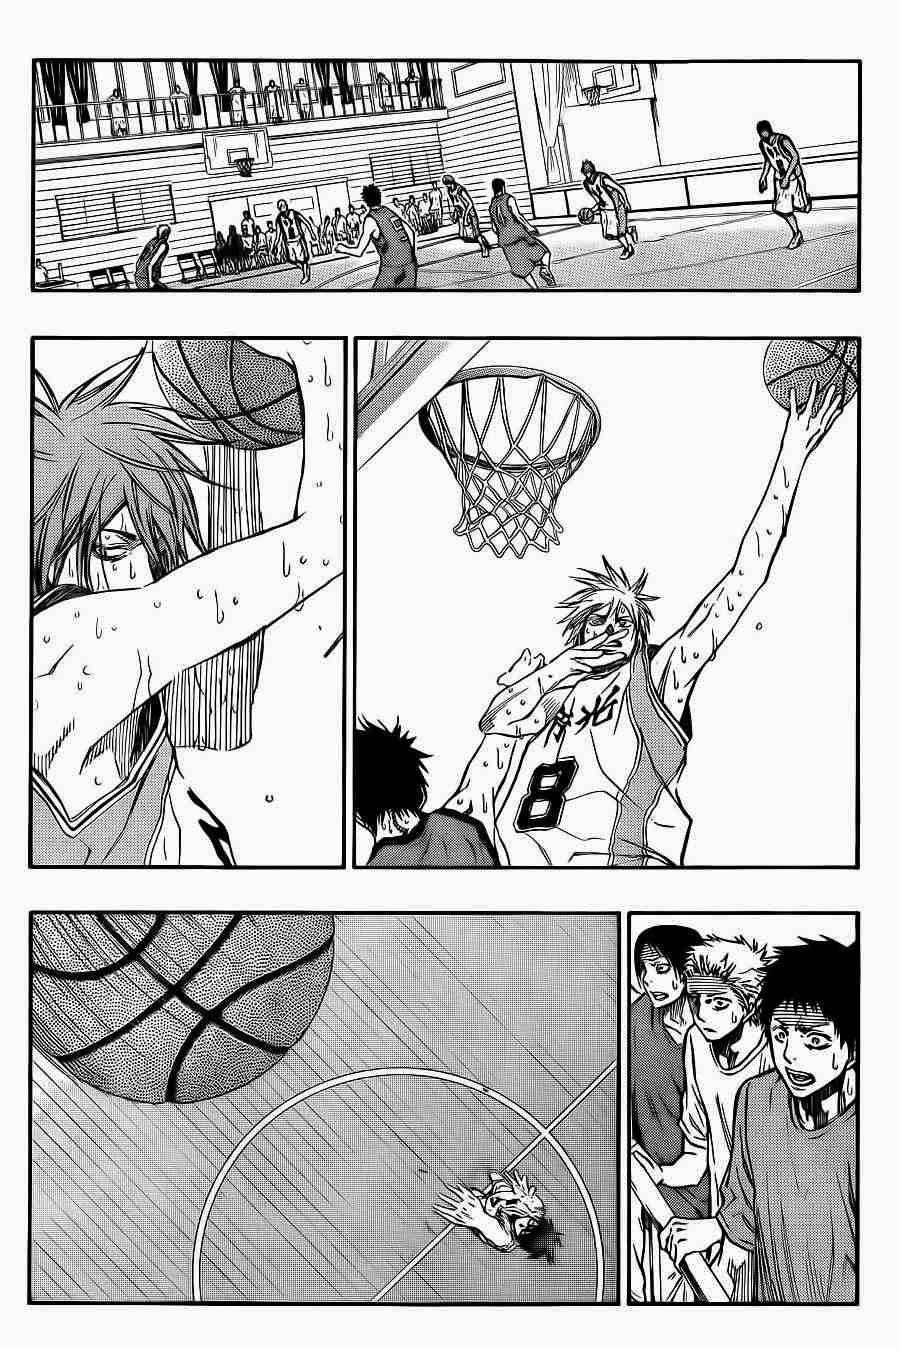 Kuroko no Basket Manga Chapter 223 - Image 08